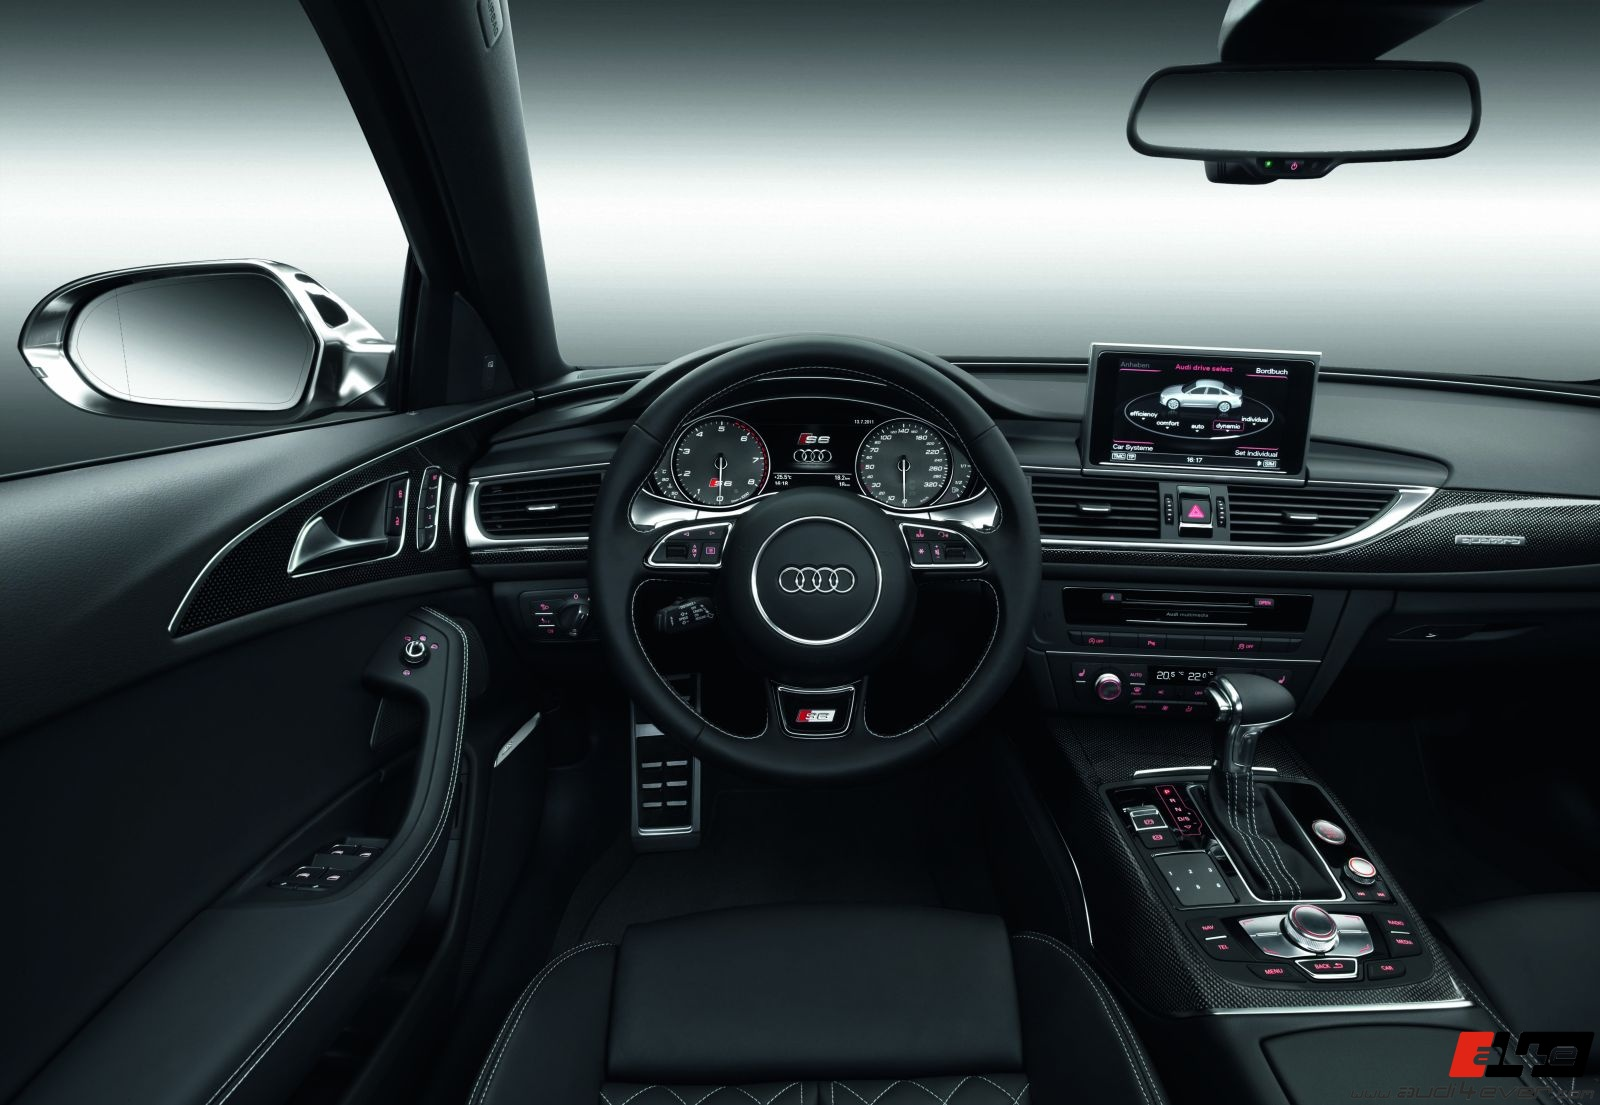 A4e Gallery Audi A6 C7 Audi S6 C7 Limousine